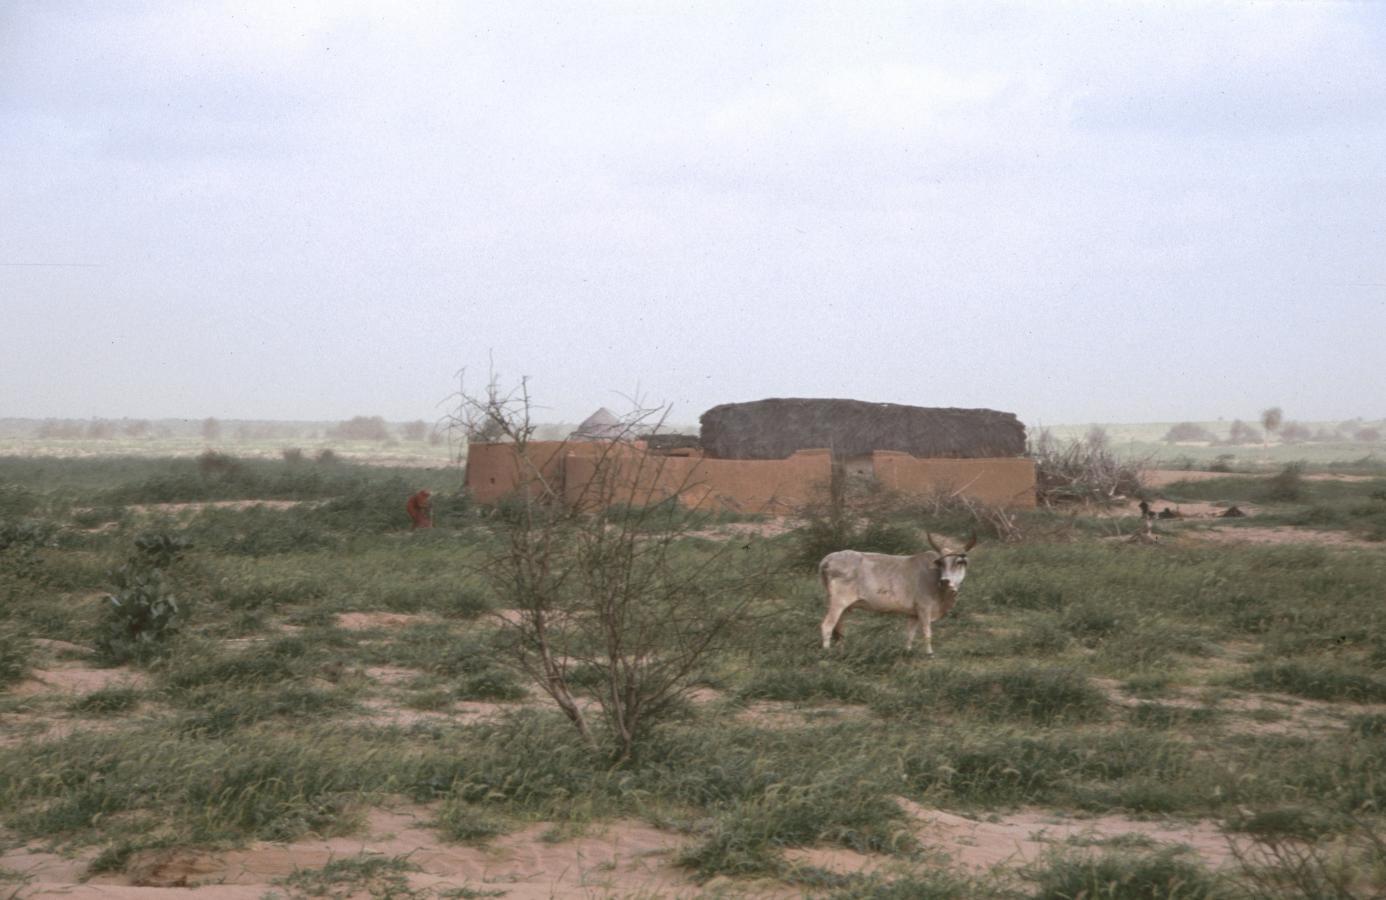 in-the-desert-around-jaisalmer-2003